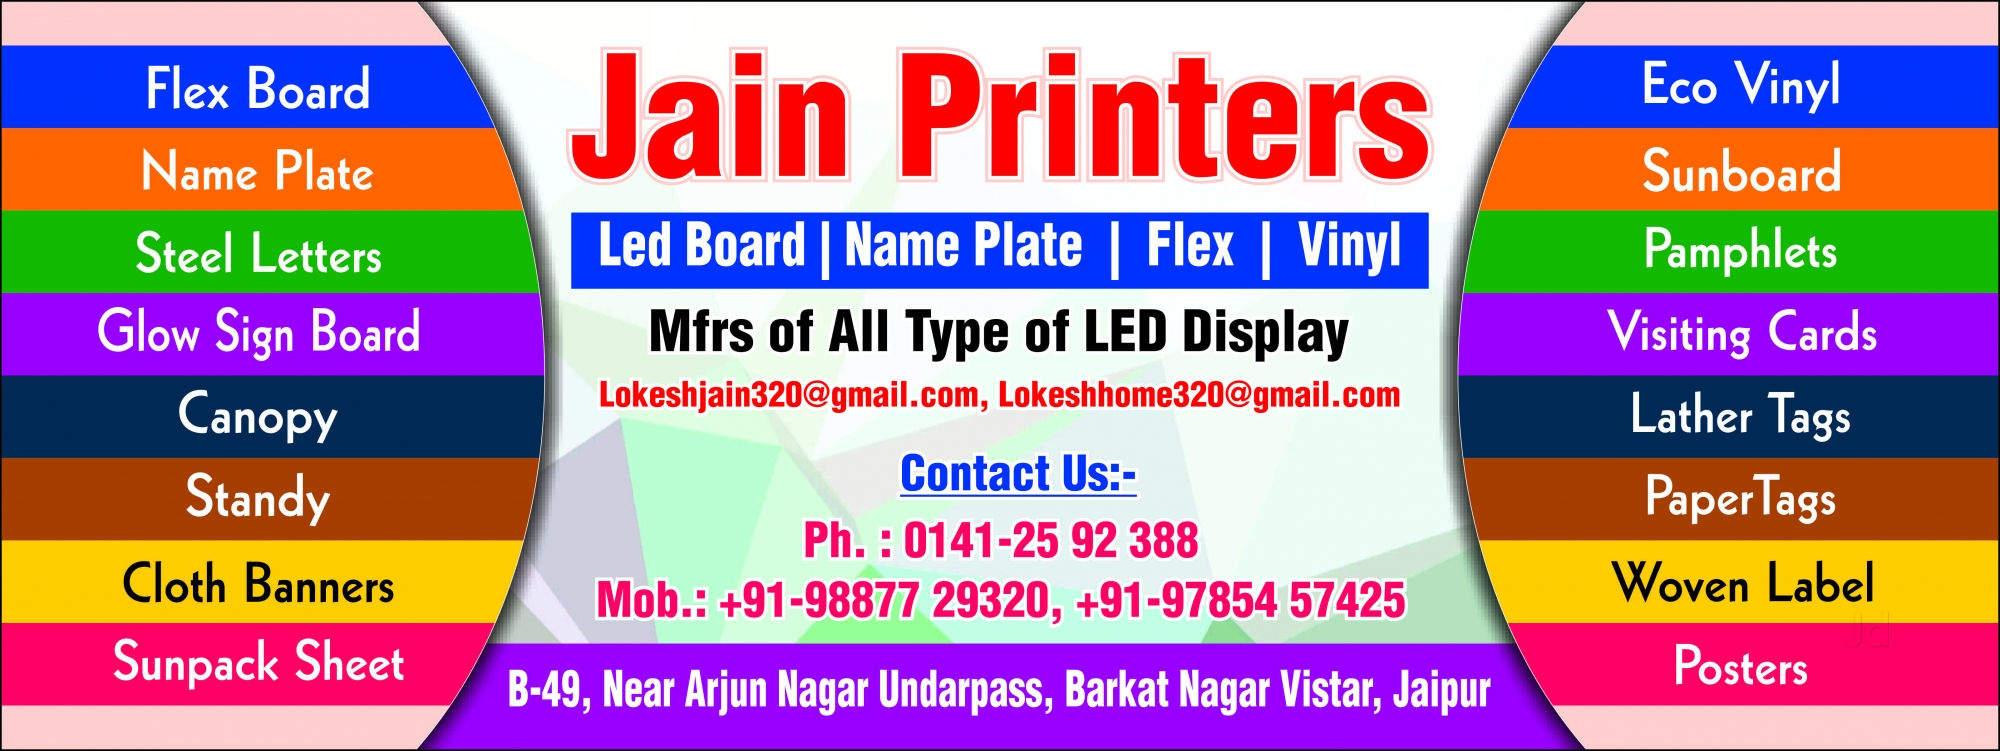 Top 100 Flex Printing in Jaipur - Best Flex Banner Printing